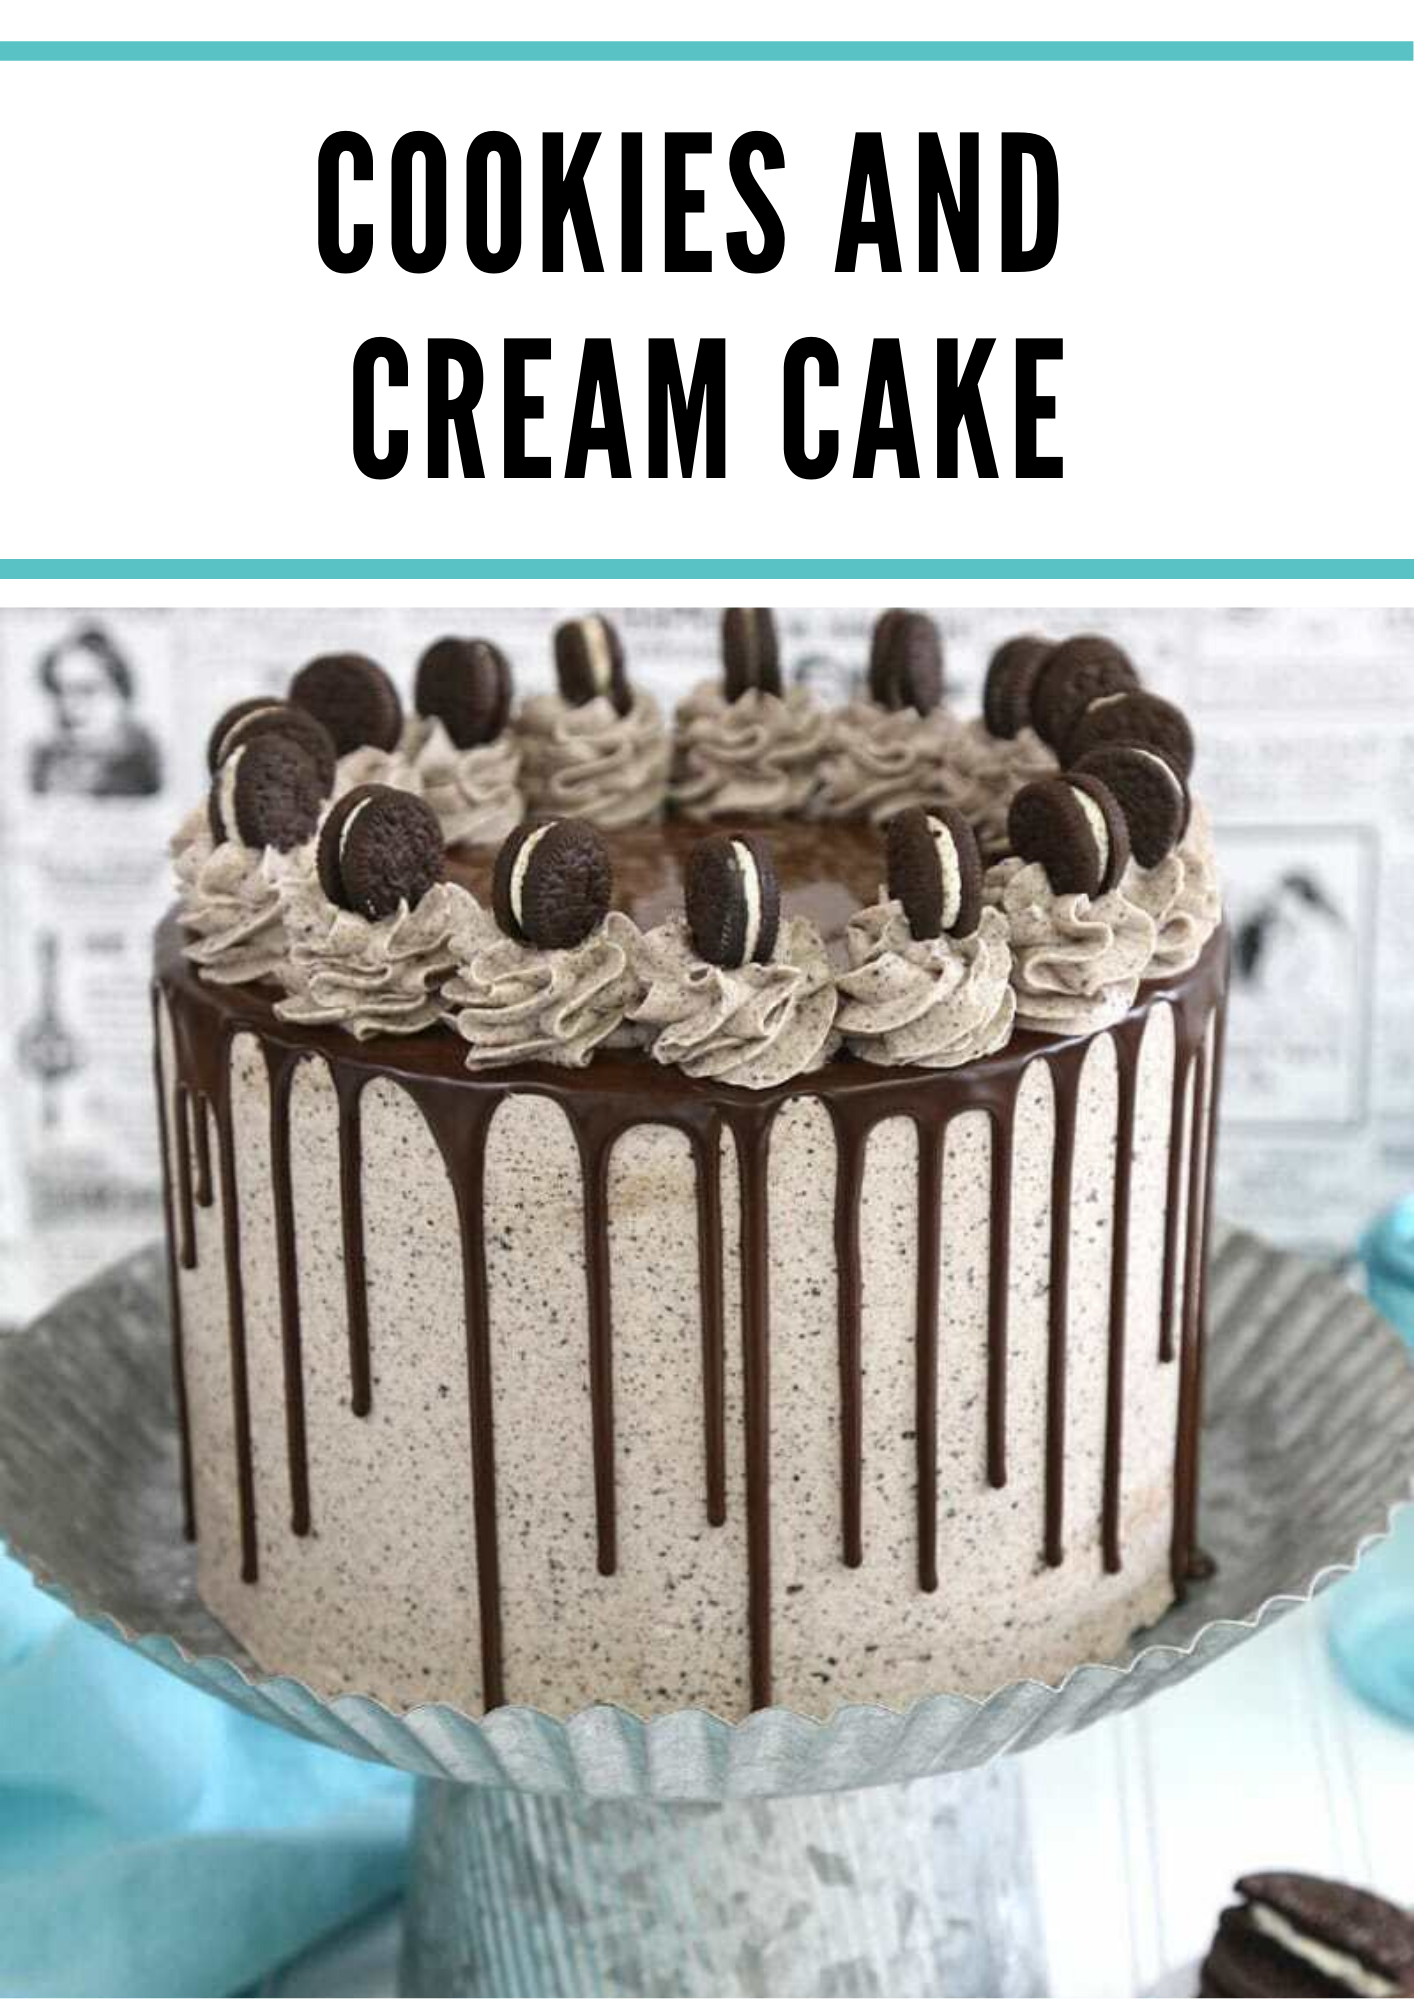 Cookies And Cream Cake In 2020 Cake Recipe With Sour Cream Easy Vanilla Cake Recipe Chocolate Cake Recipe Easy